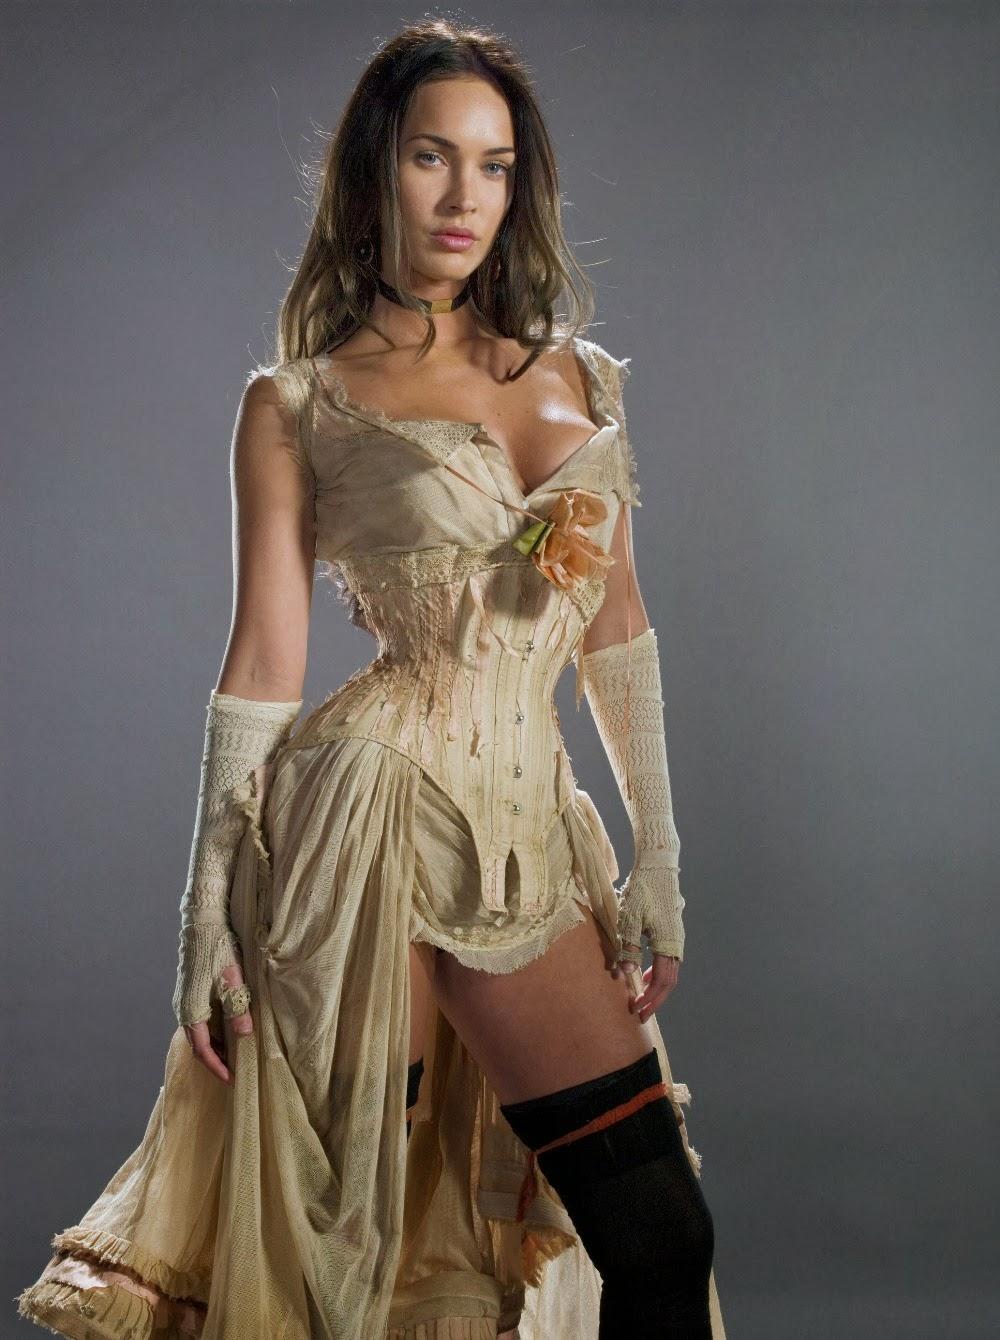 Stars Nude Pictures Of Megan Fox Jpg